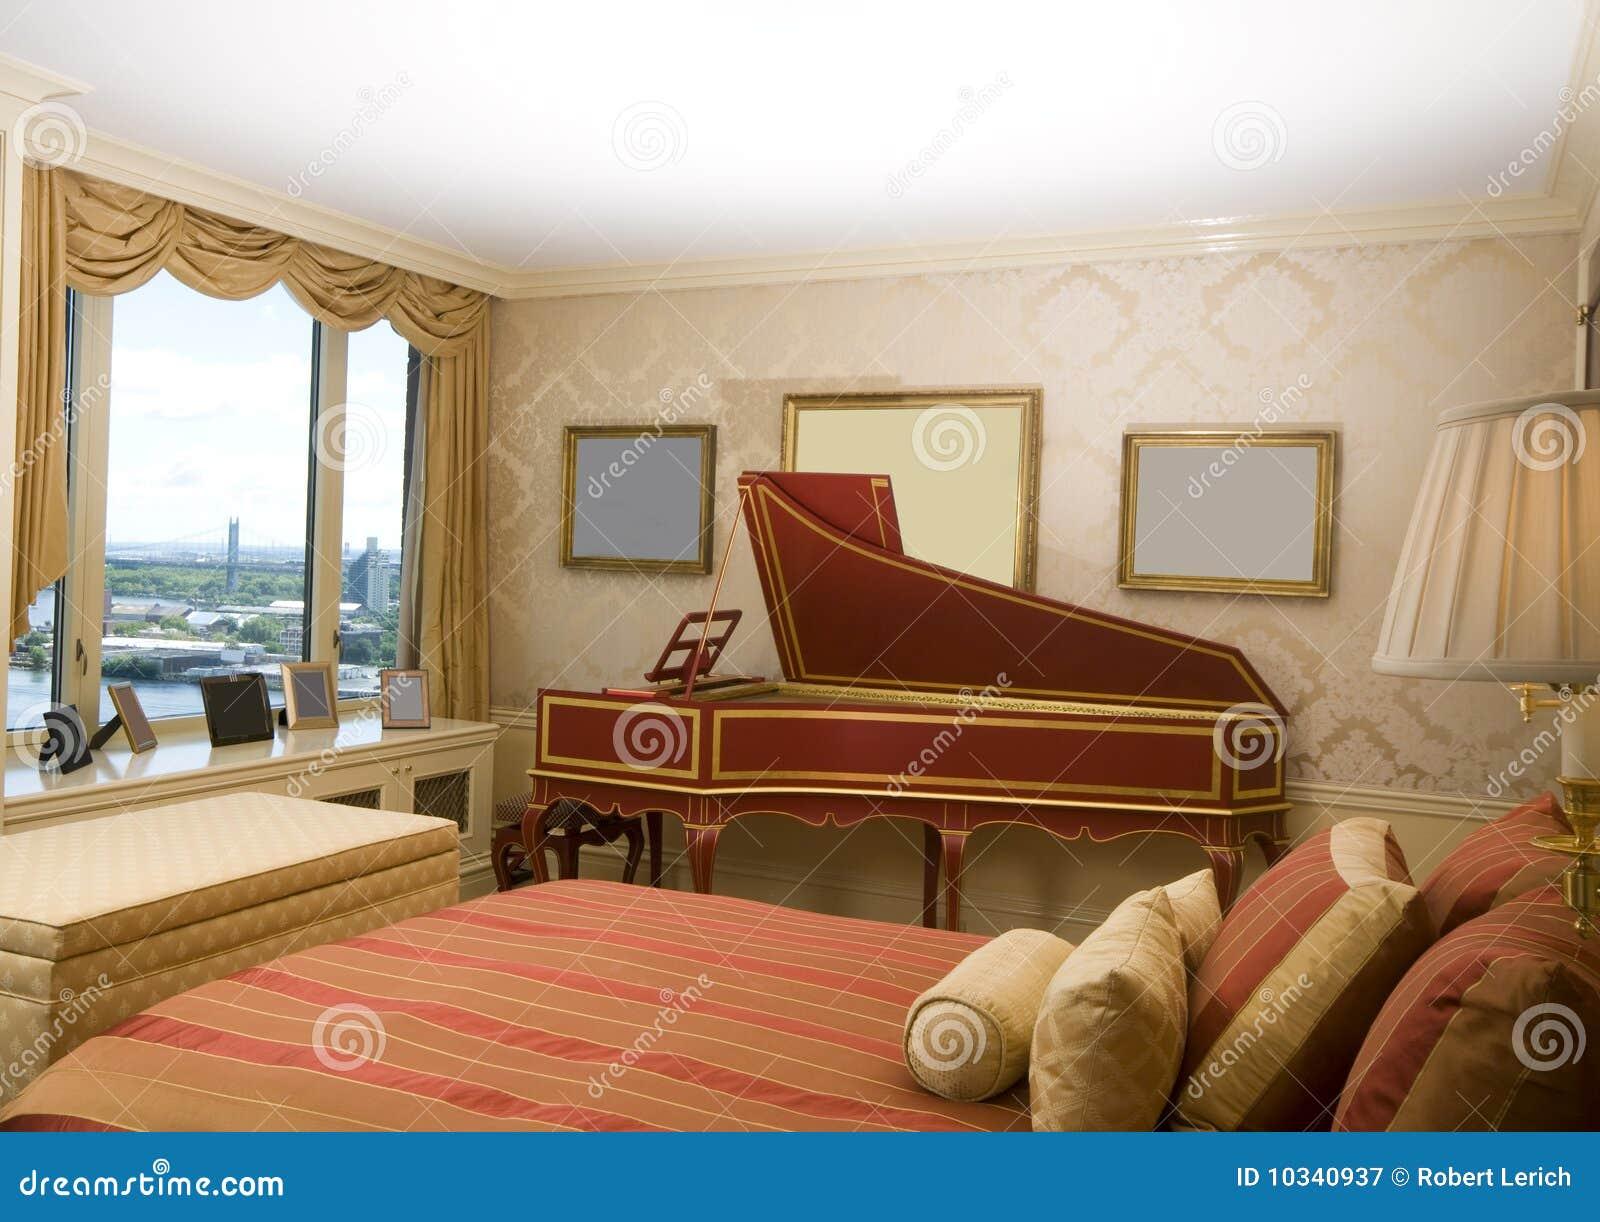 Master Bedroom Harpsichord Penthouse New York Stock Image Image 10340937